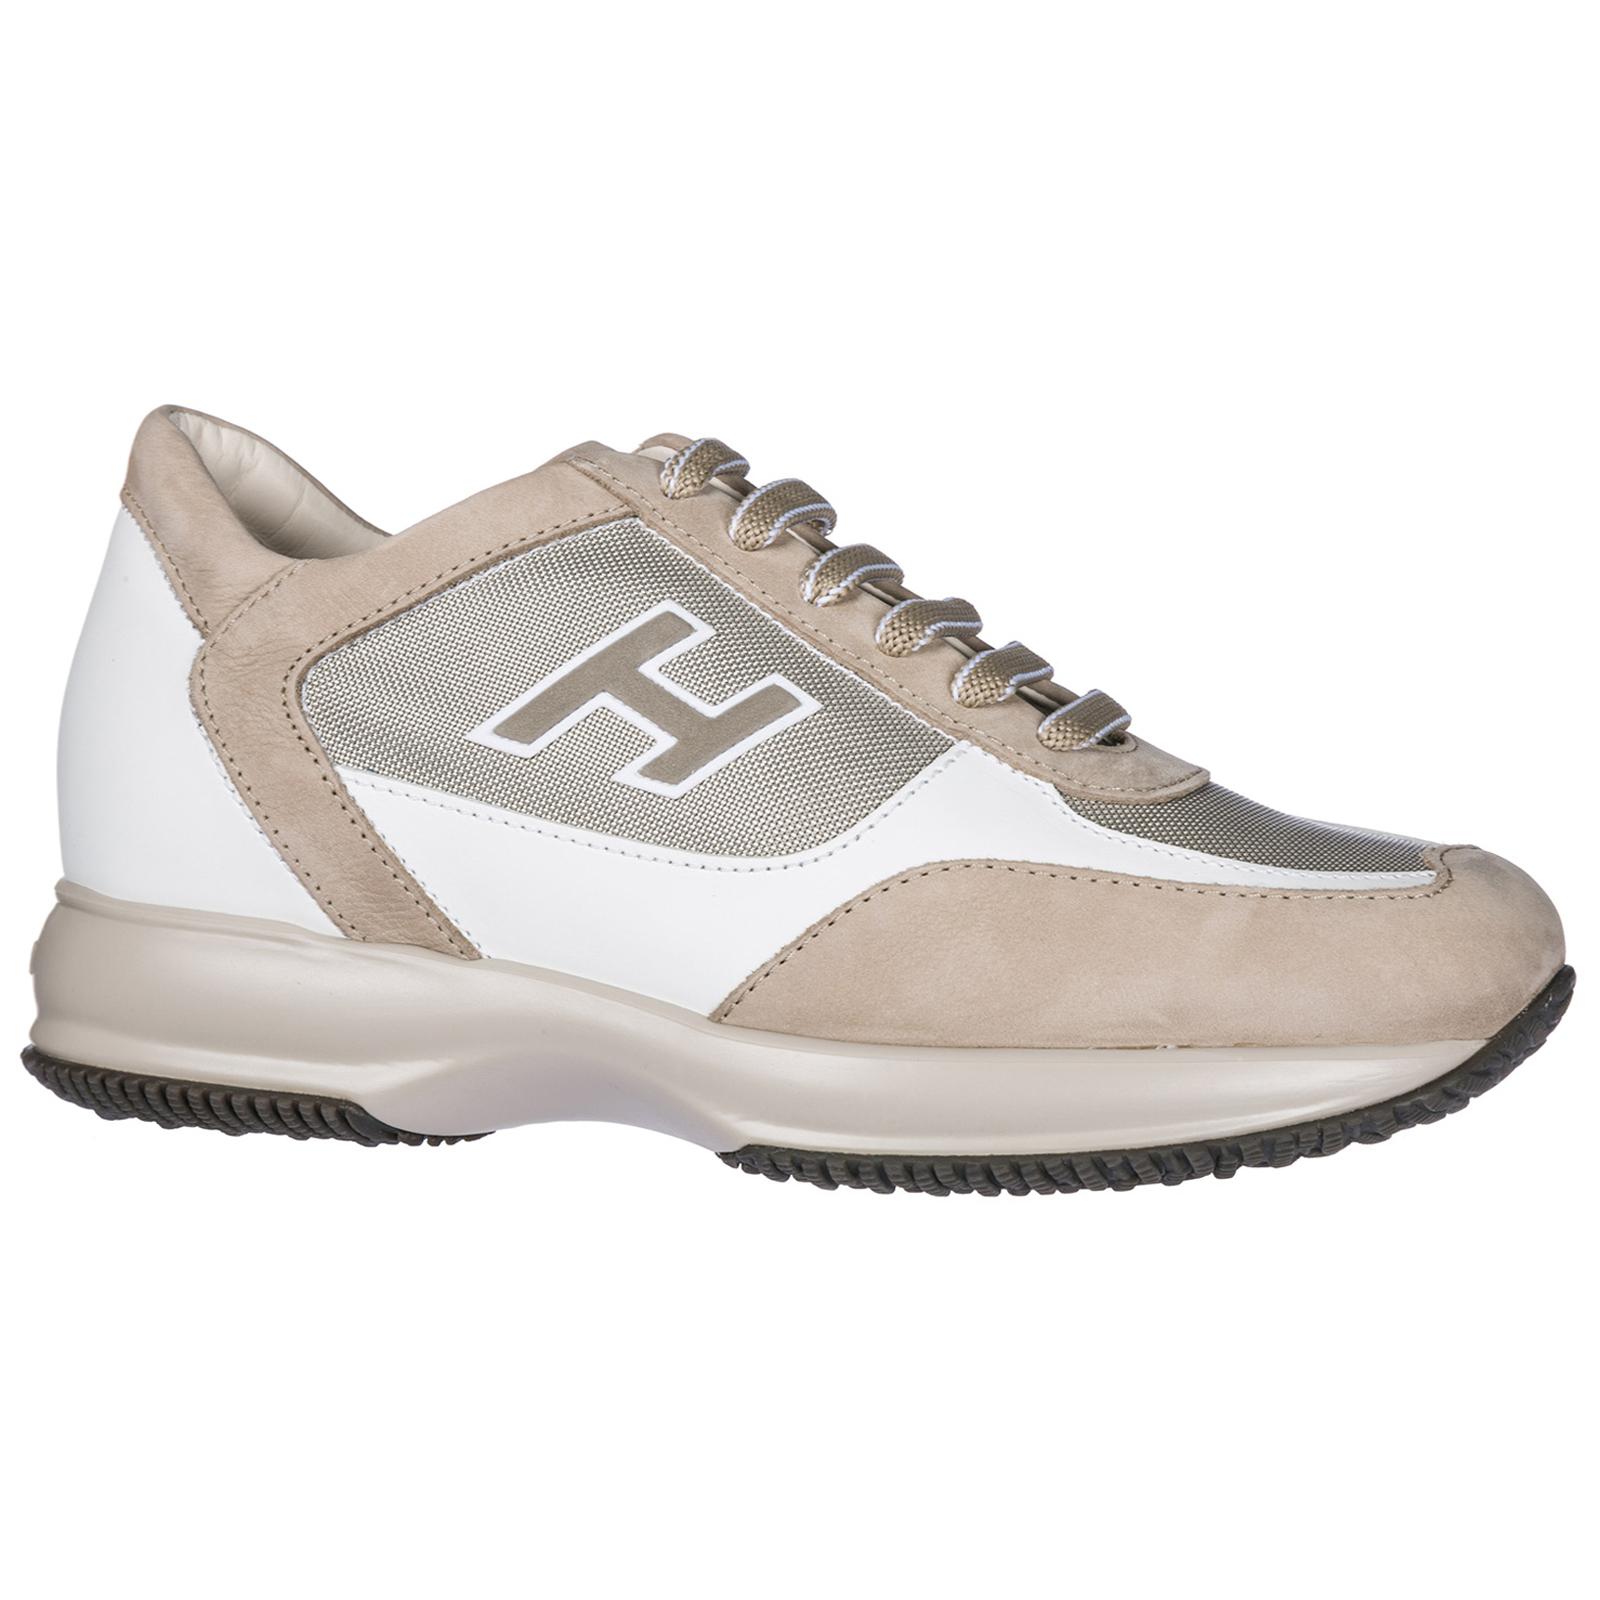 In Interactive Pelle Sneakers Uomo H Flock Scarpe IYD29WHE